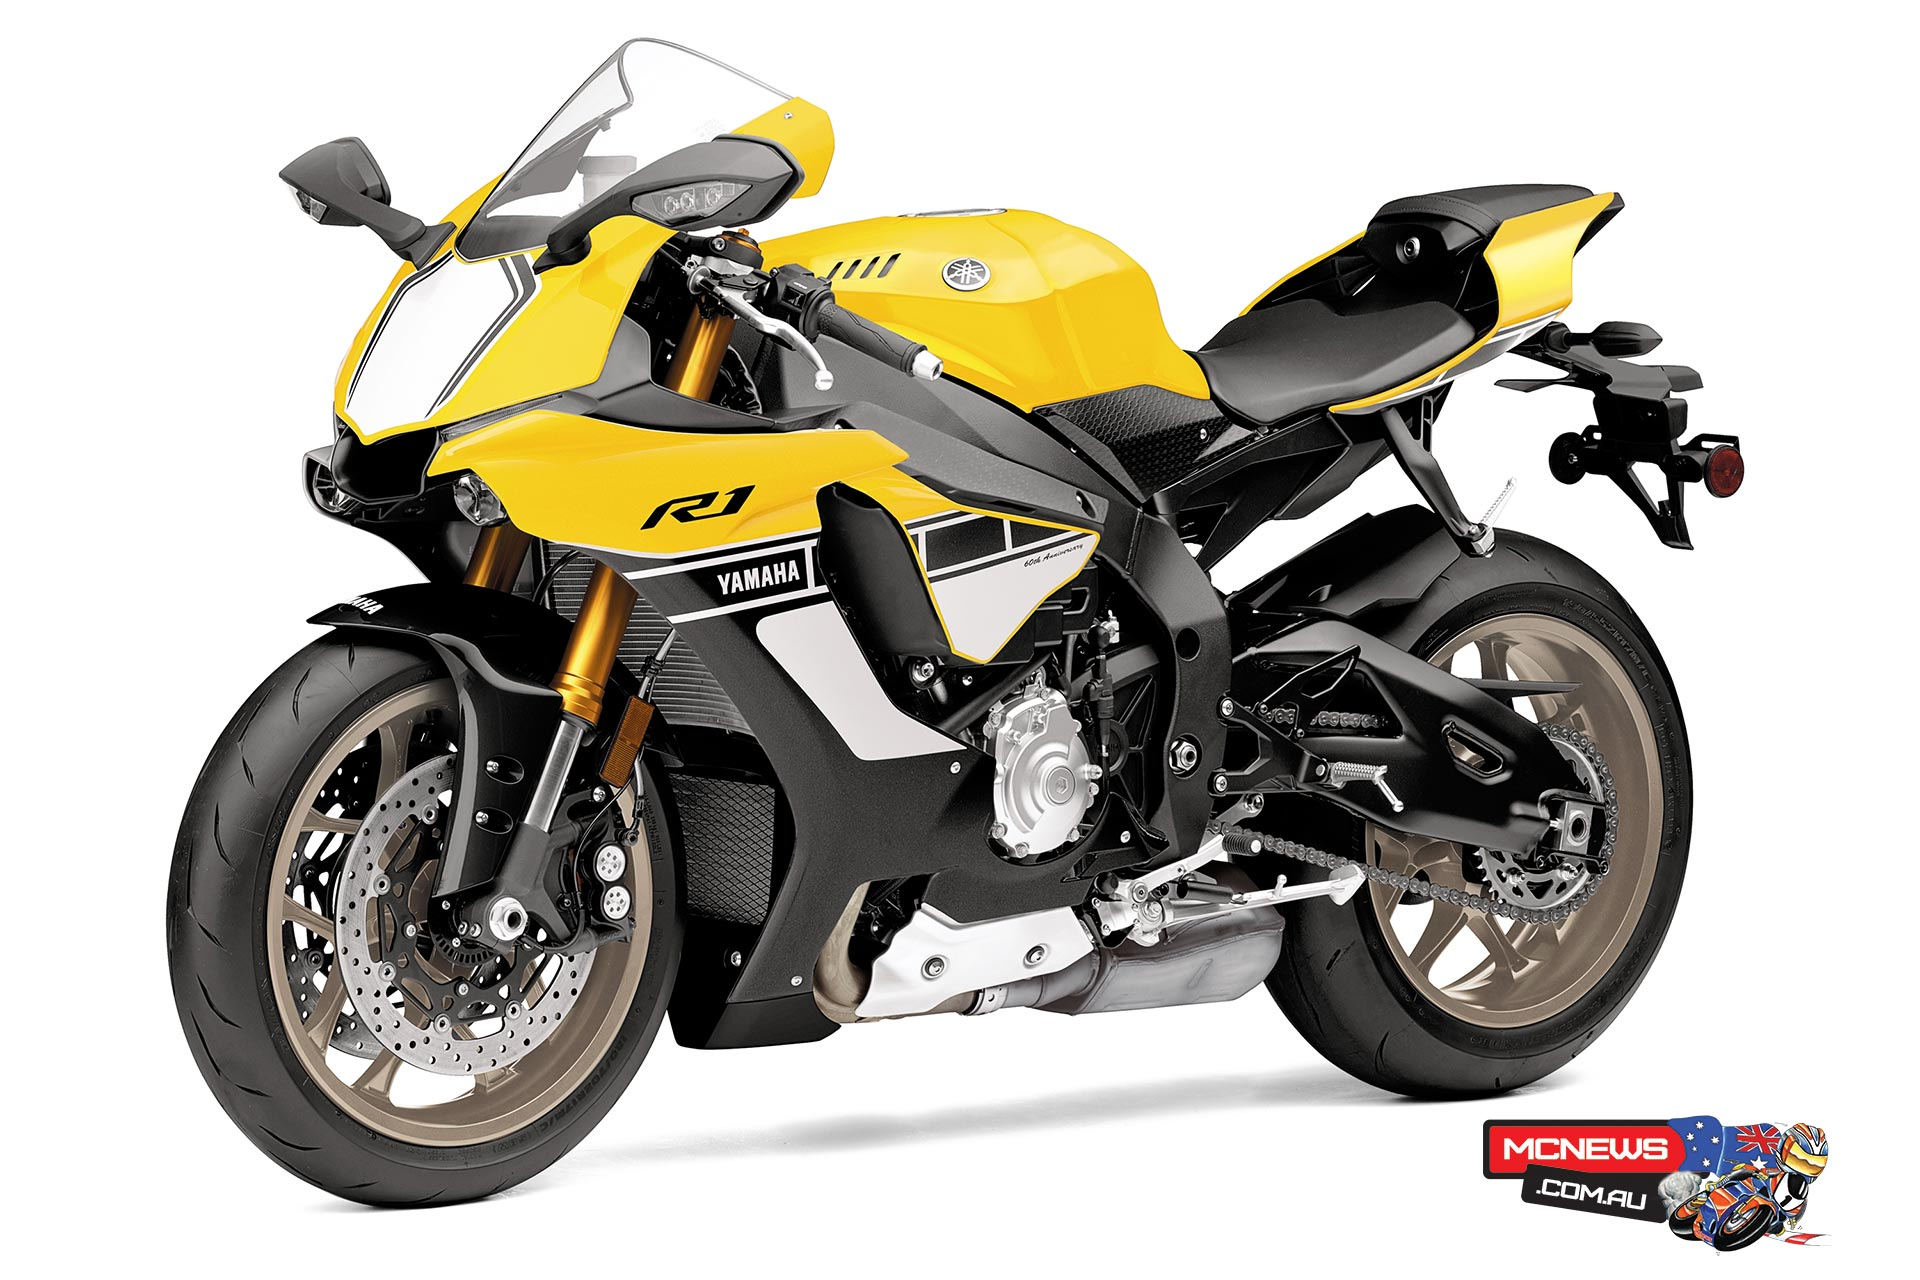 2016 Yamaha Yzf R1 Yzf R6 Colours Mcnews Com Au